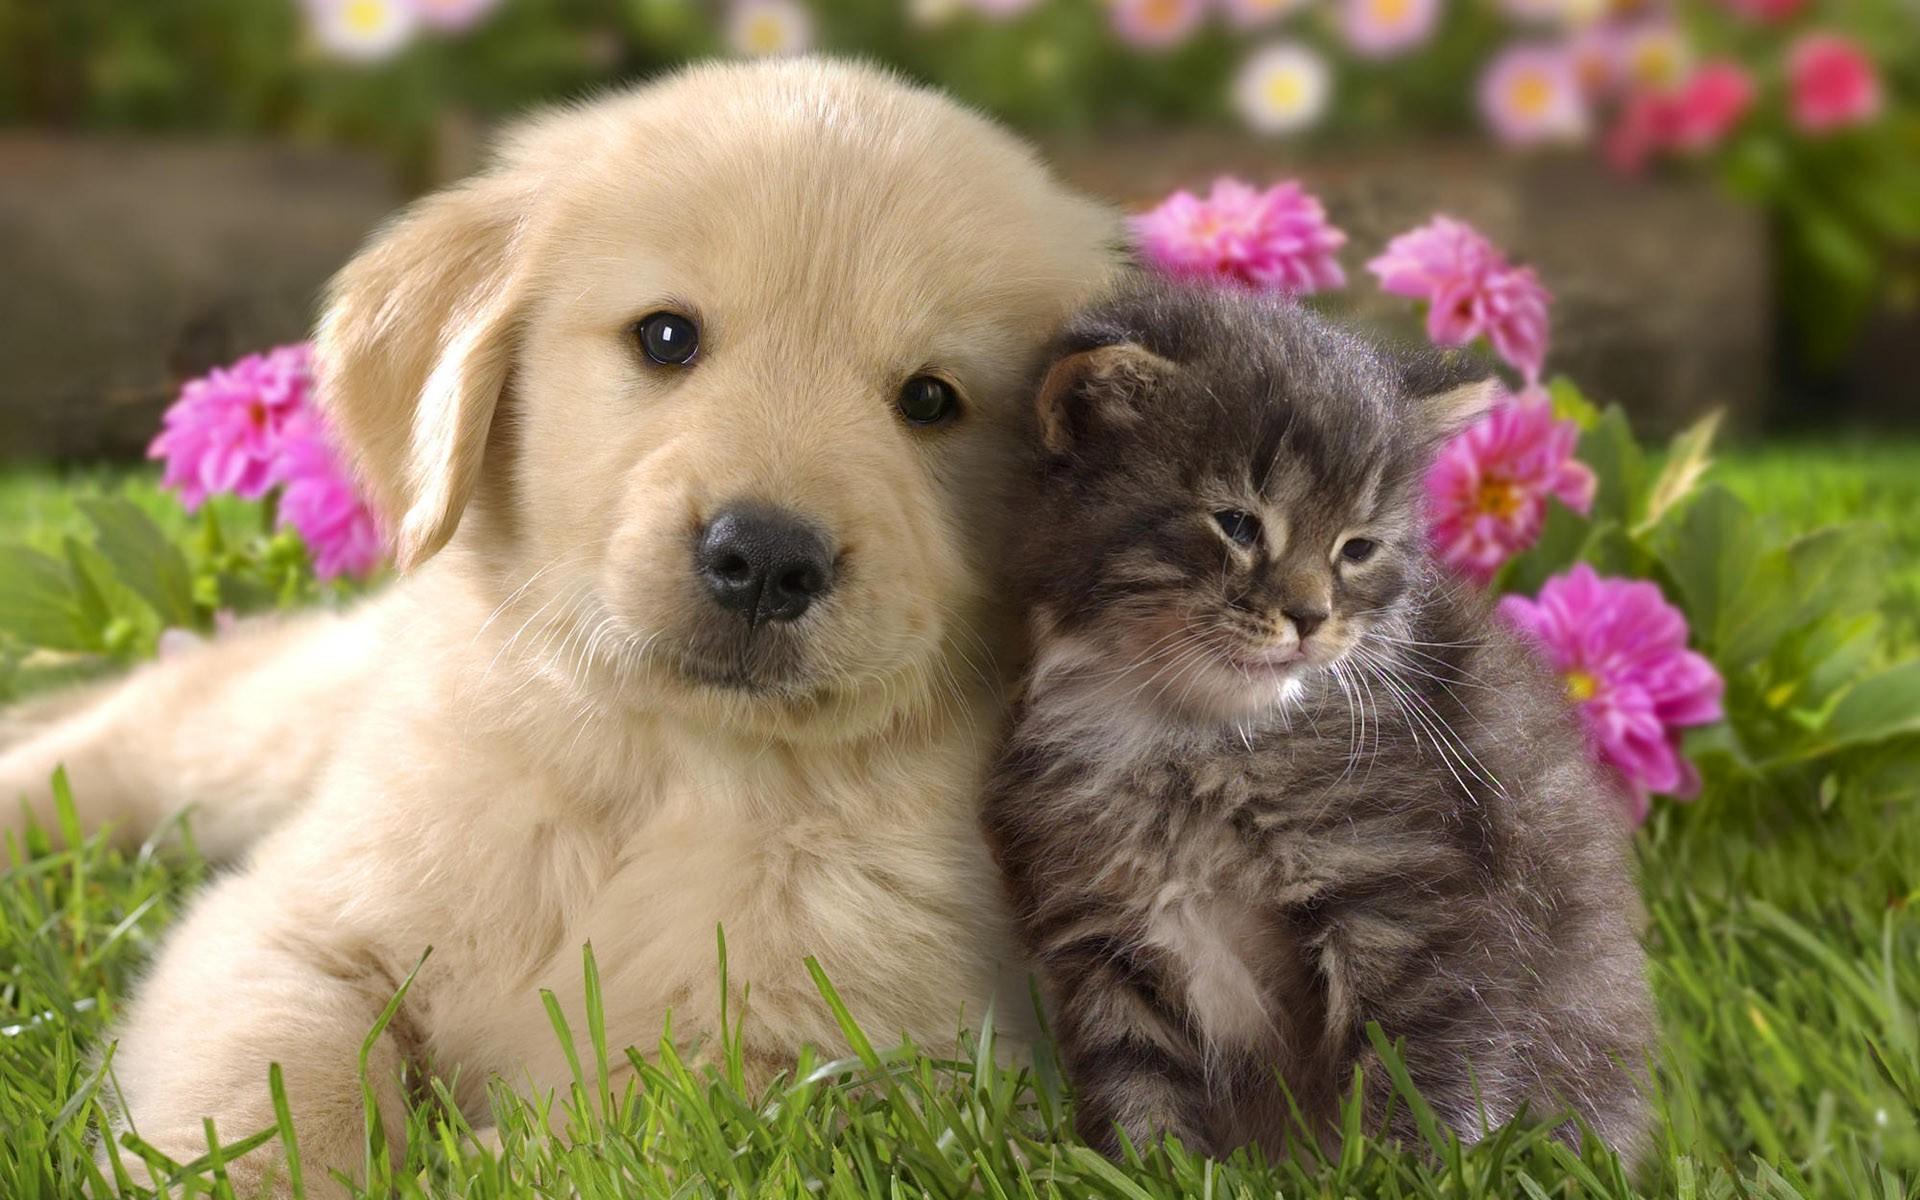 Cute Dog and Cat Wallpaper 1920x1200